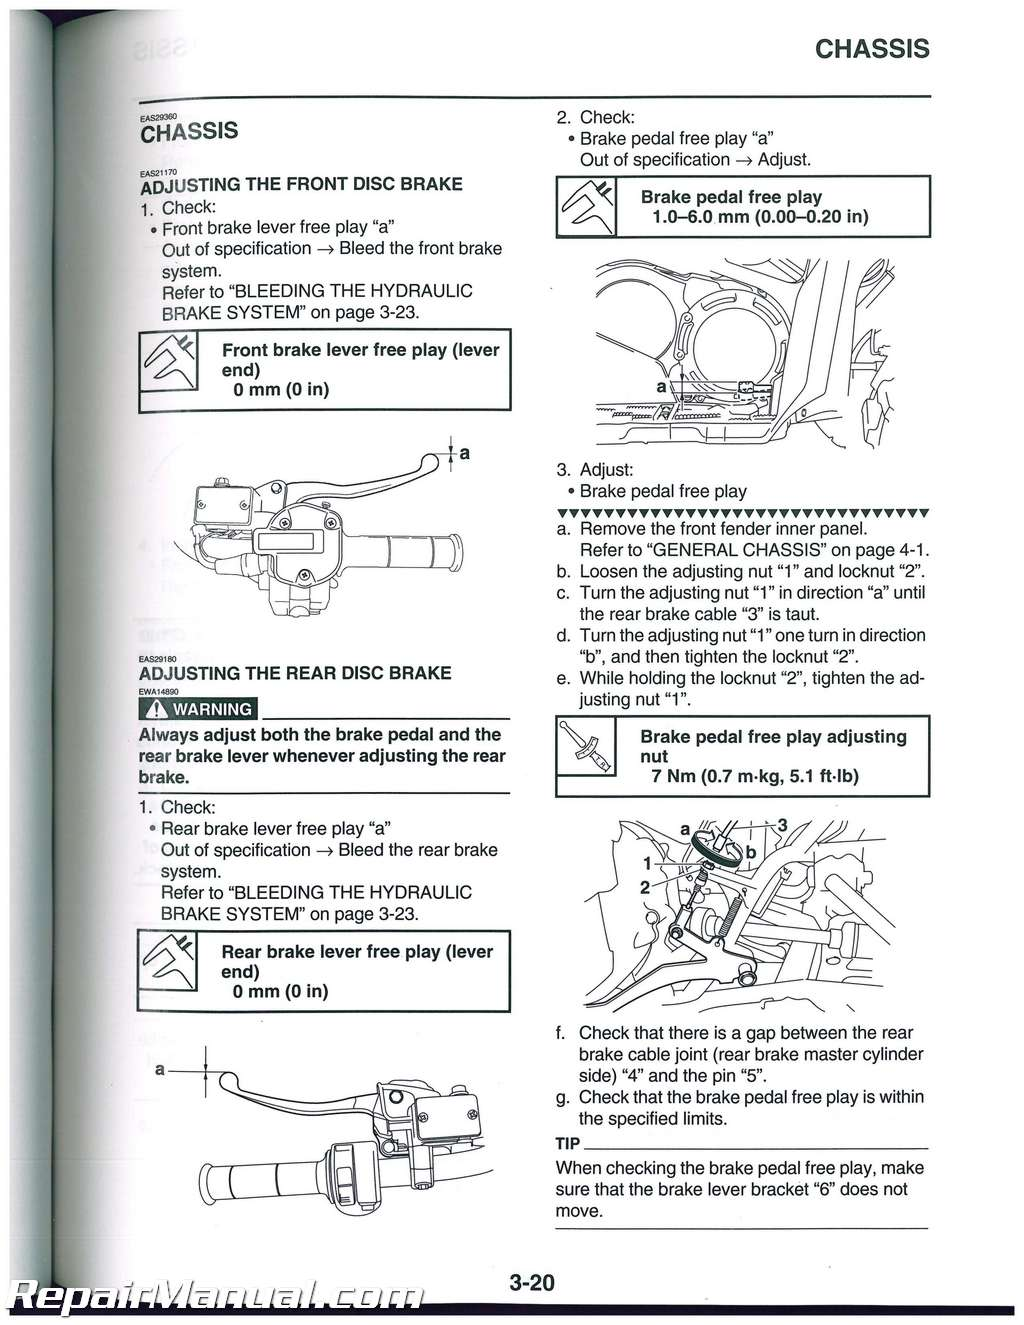 Yamaha Yfm550 Yfm700 Grizzly Atv Service Manual